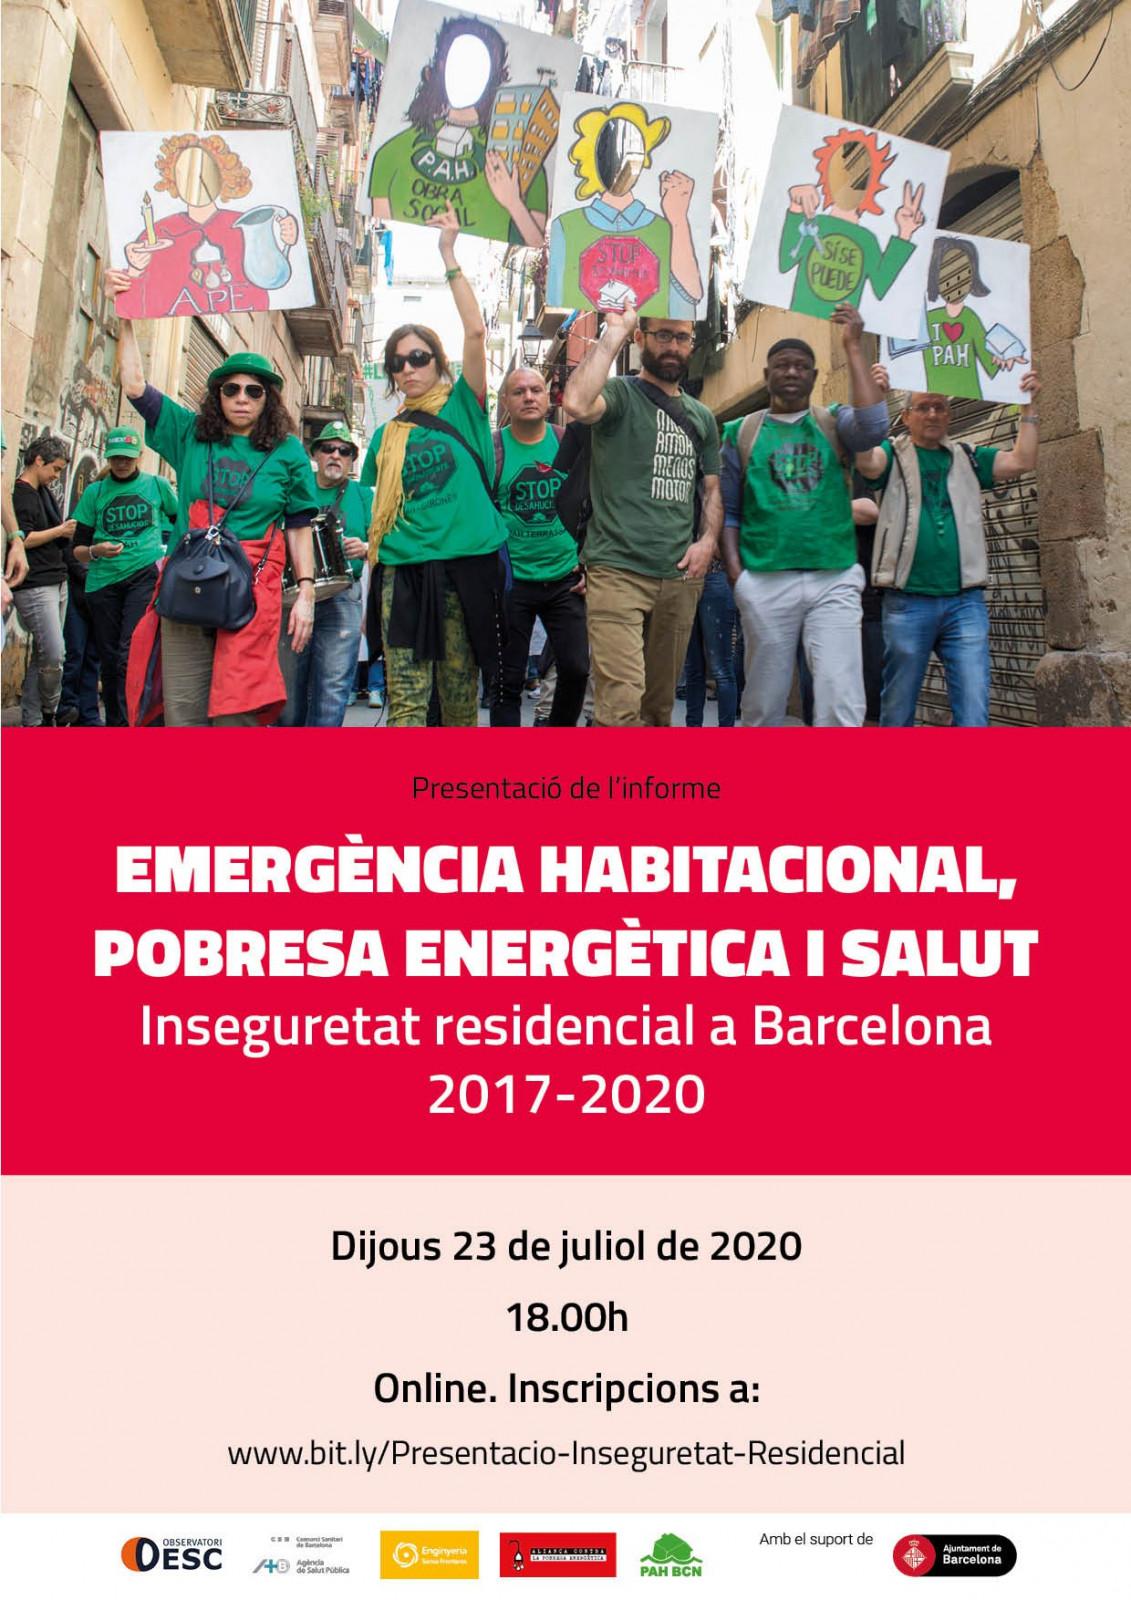 informe-emergencia-habitacional-pobresa-energetica-salut-barcelona-2017-2020.jpg